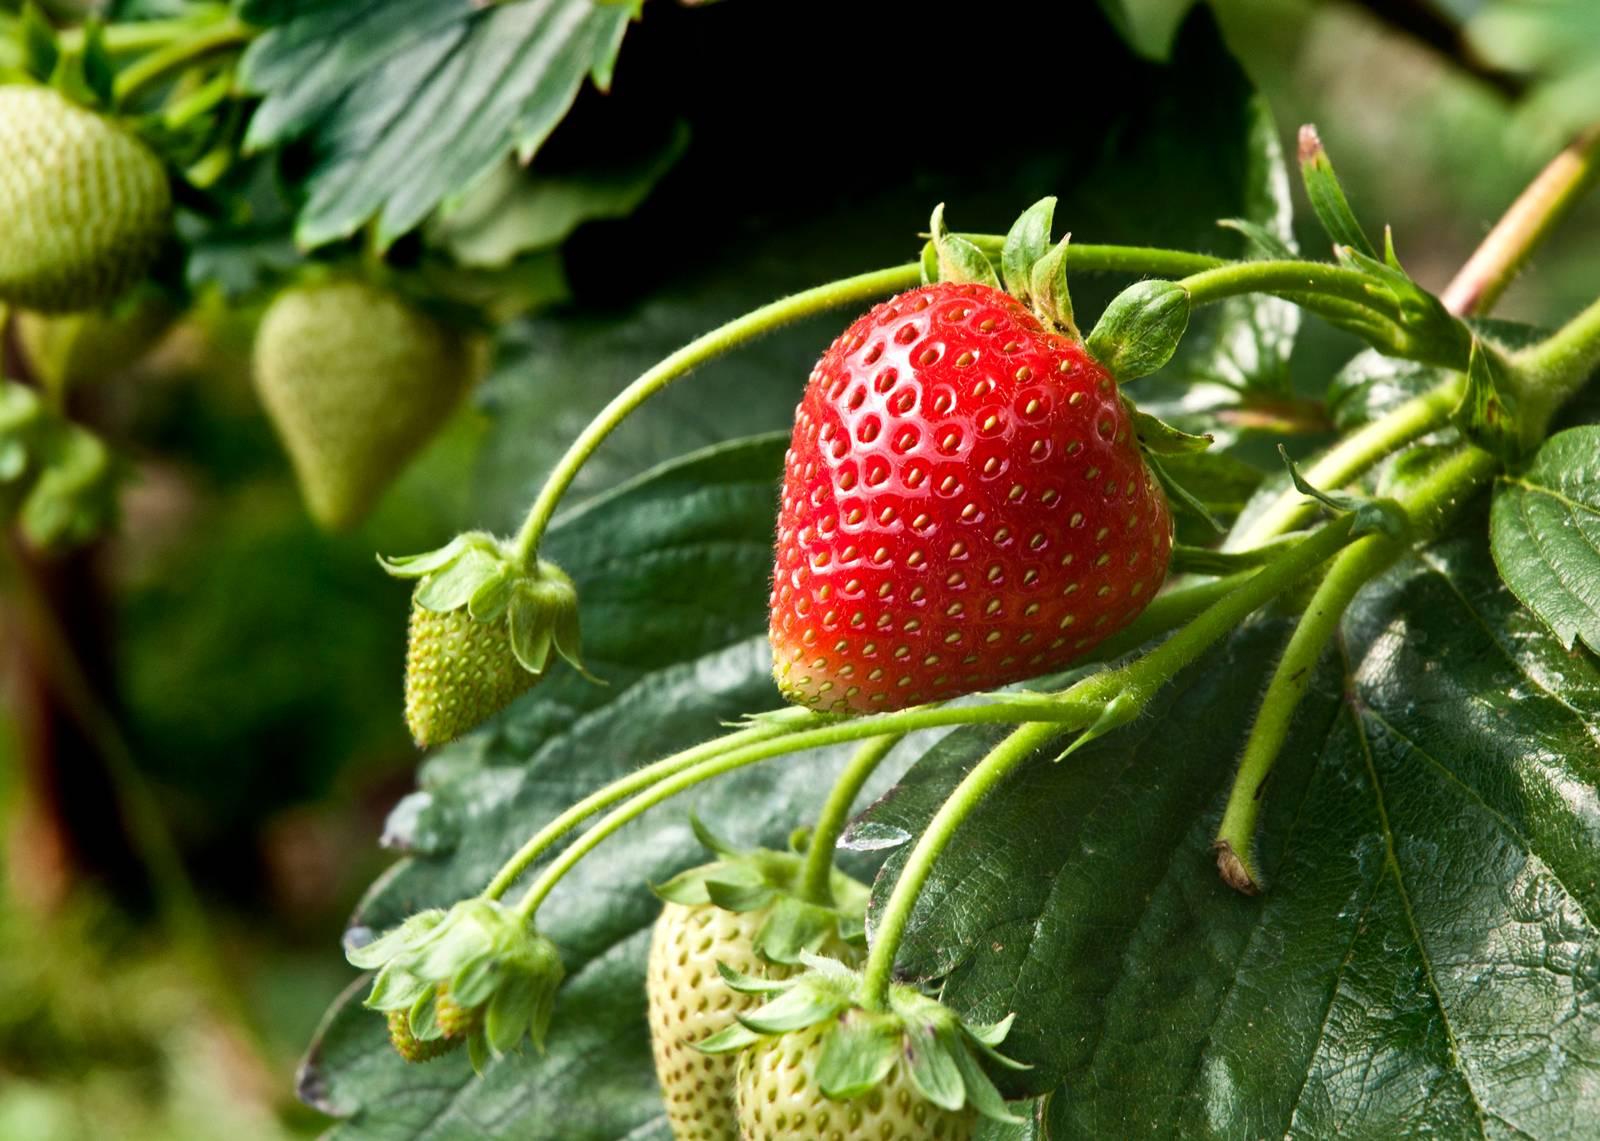 King Strawberry